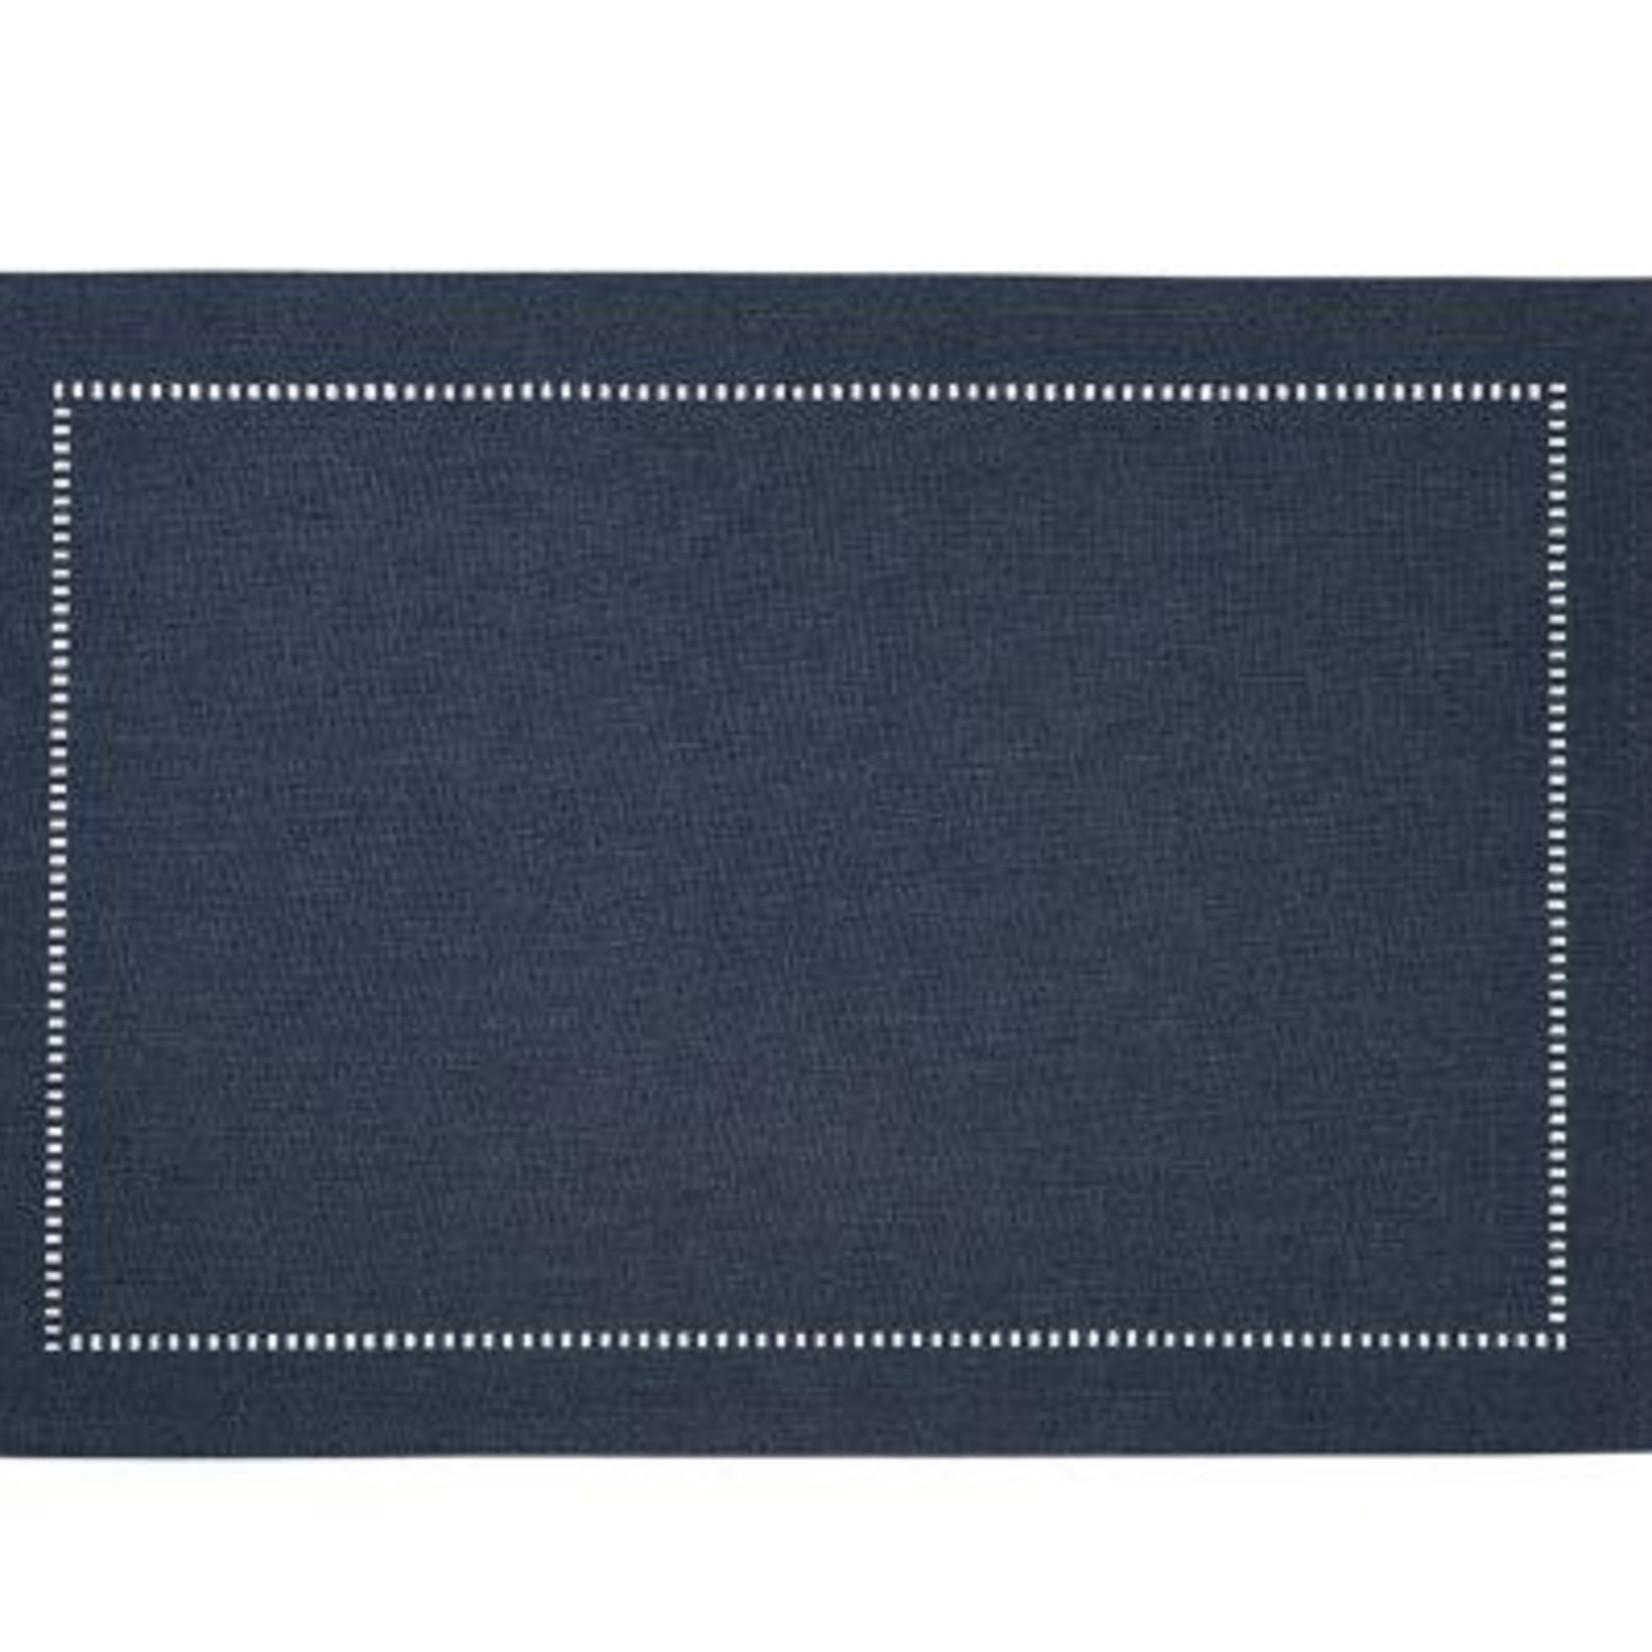 Linen Look Placemat Navy